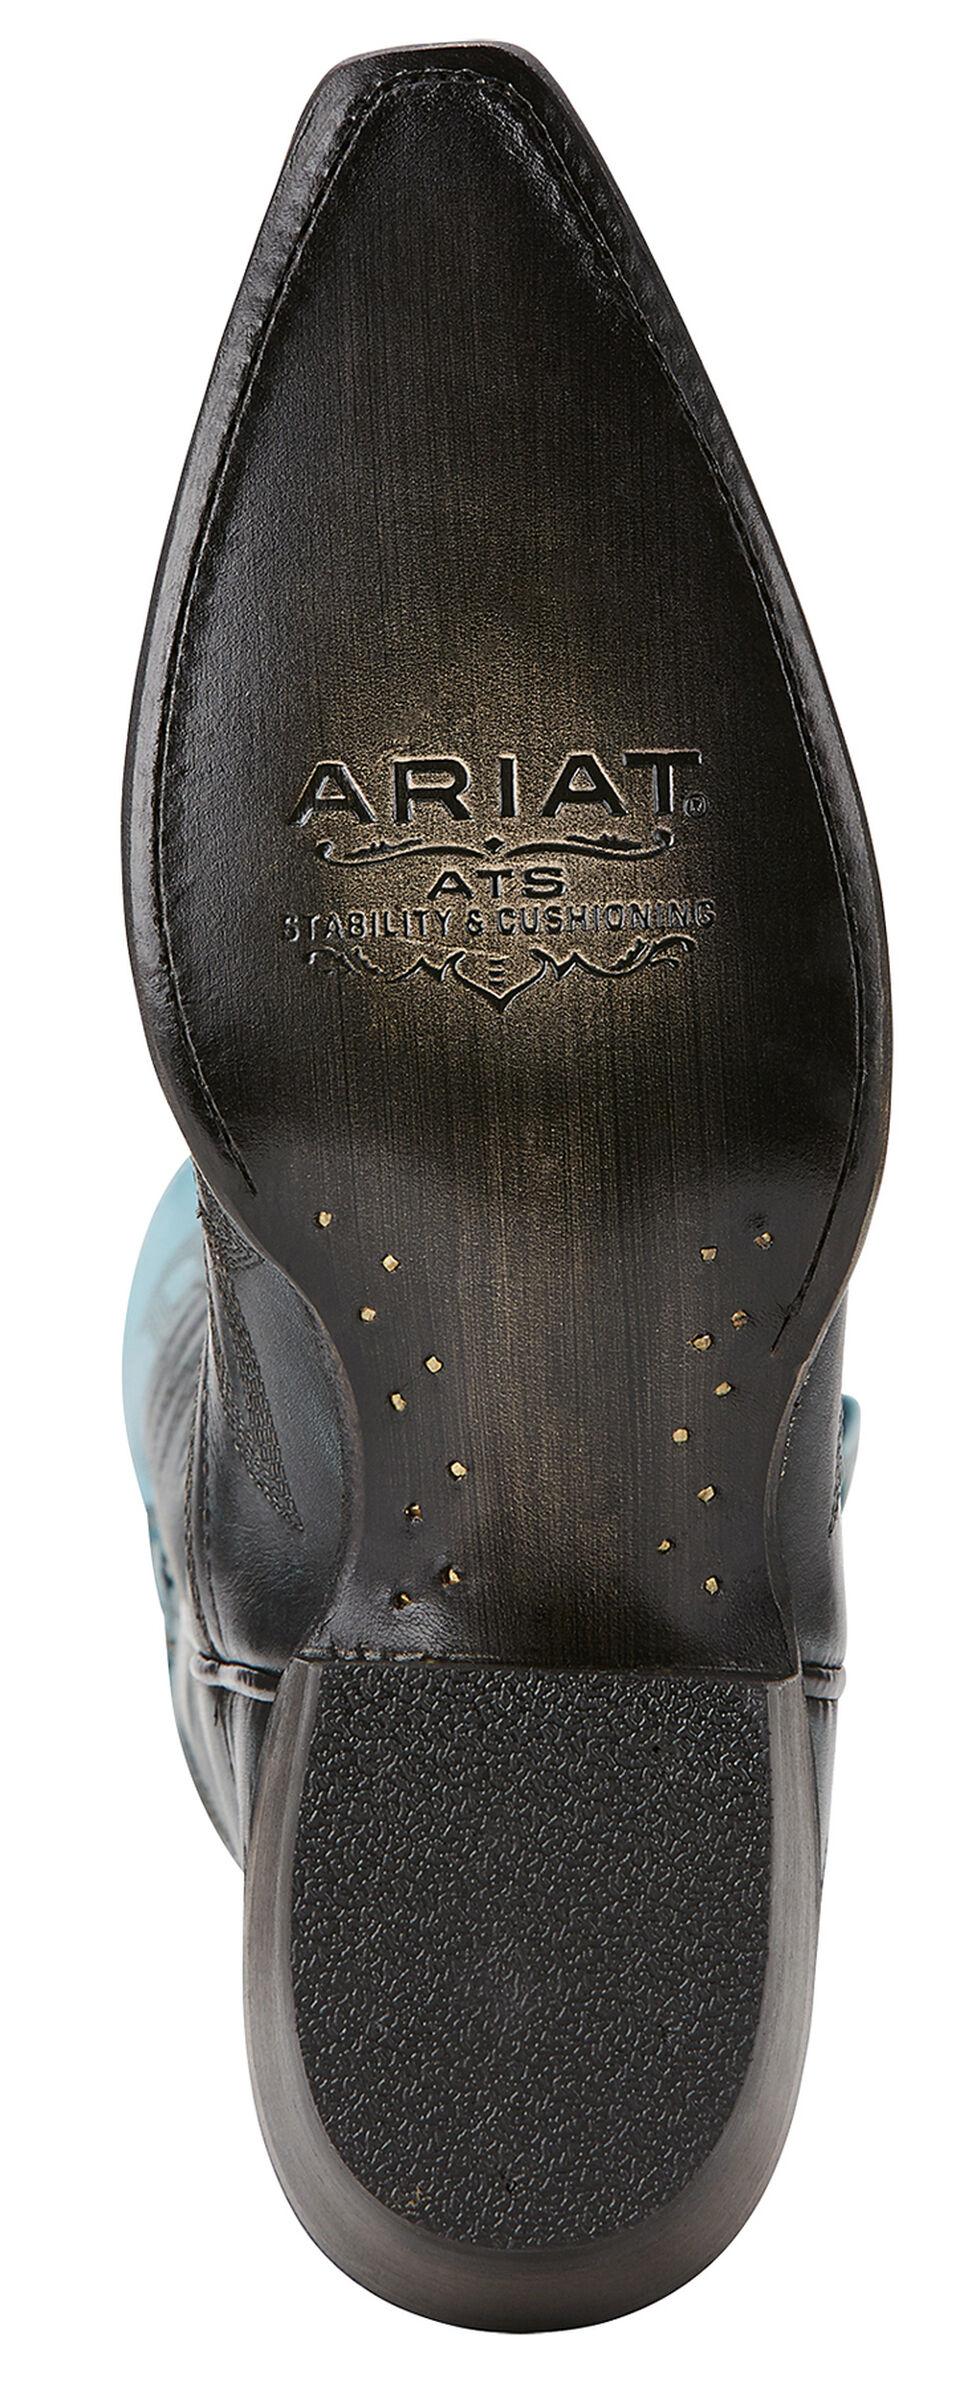 Ariat Blue Ombre Cowgirl Boots - Snip Toe, , hi-res